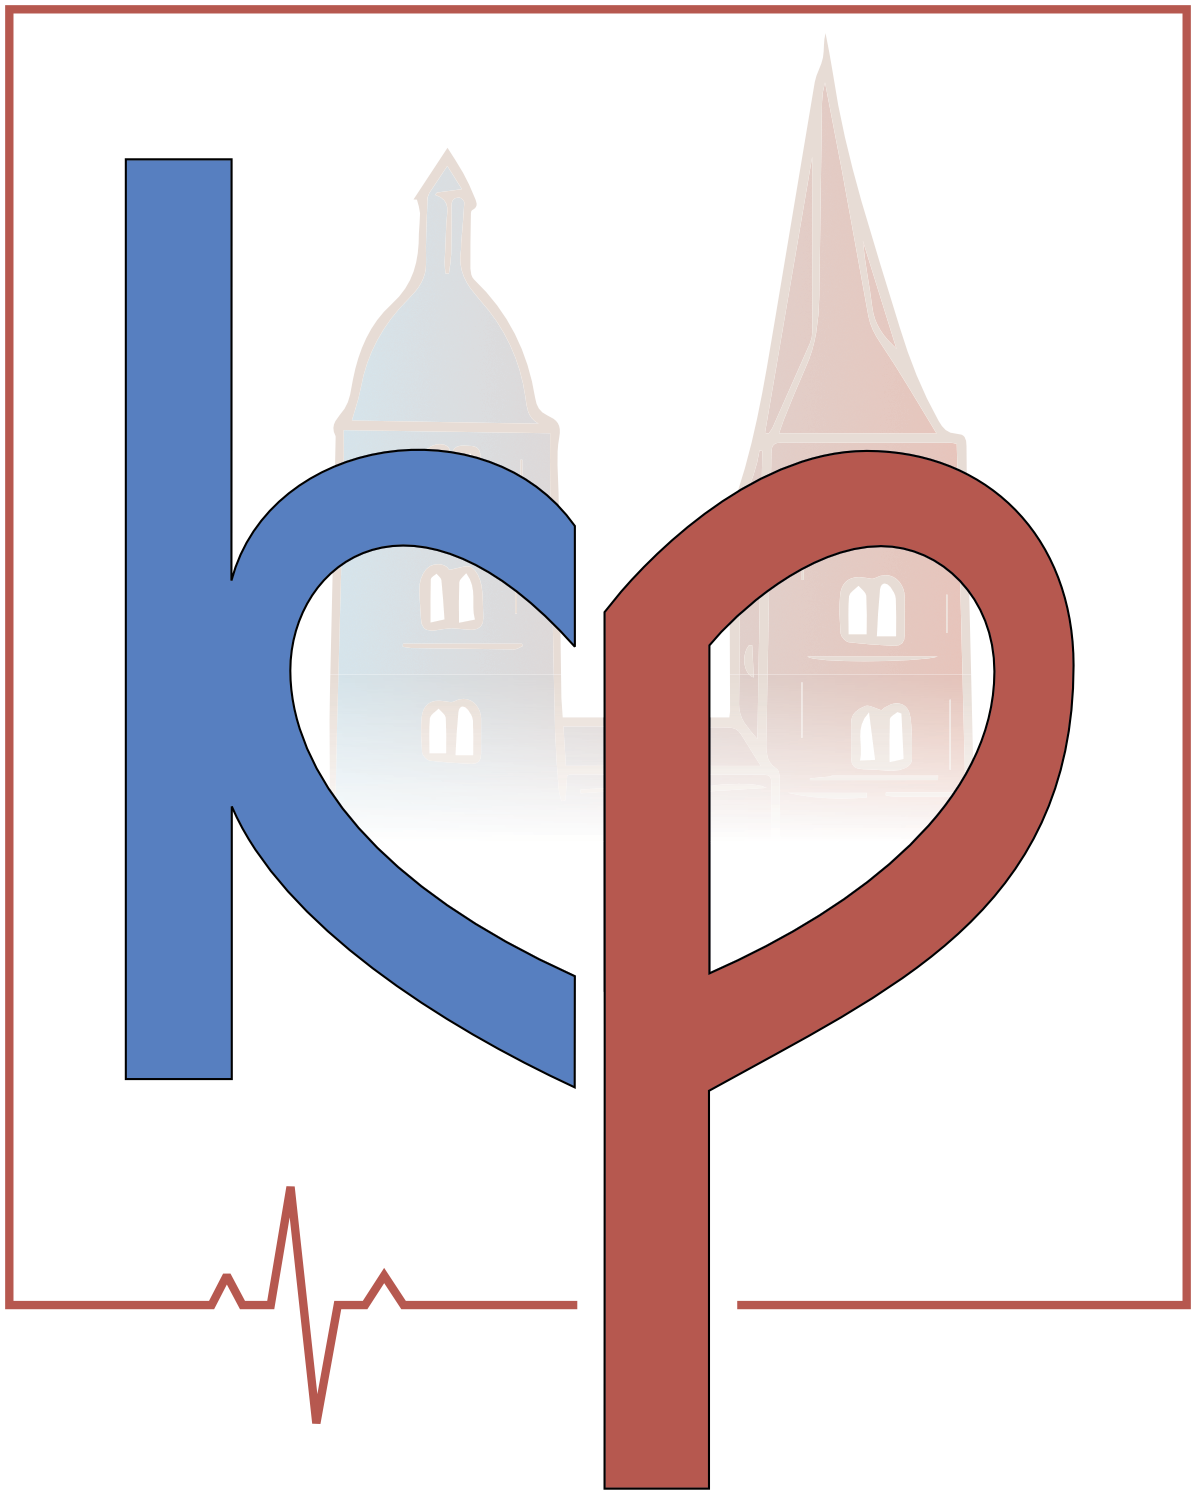 Kardiologisch-Hausärztliche Praxis Pauli